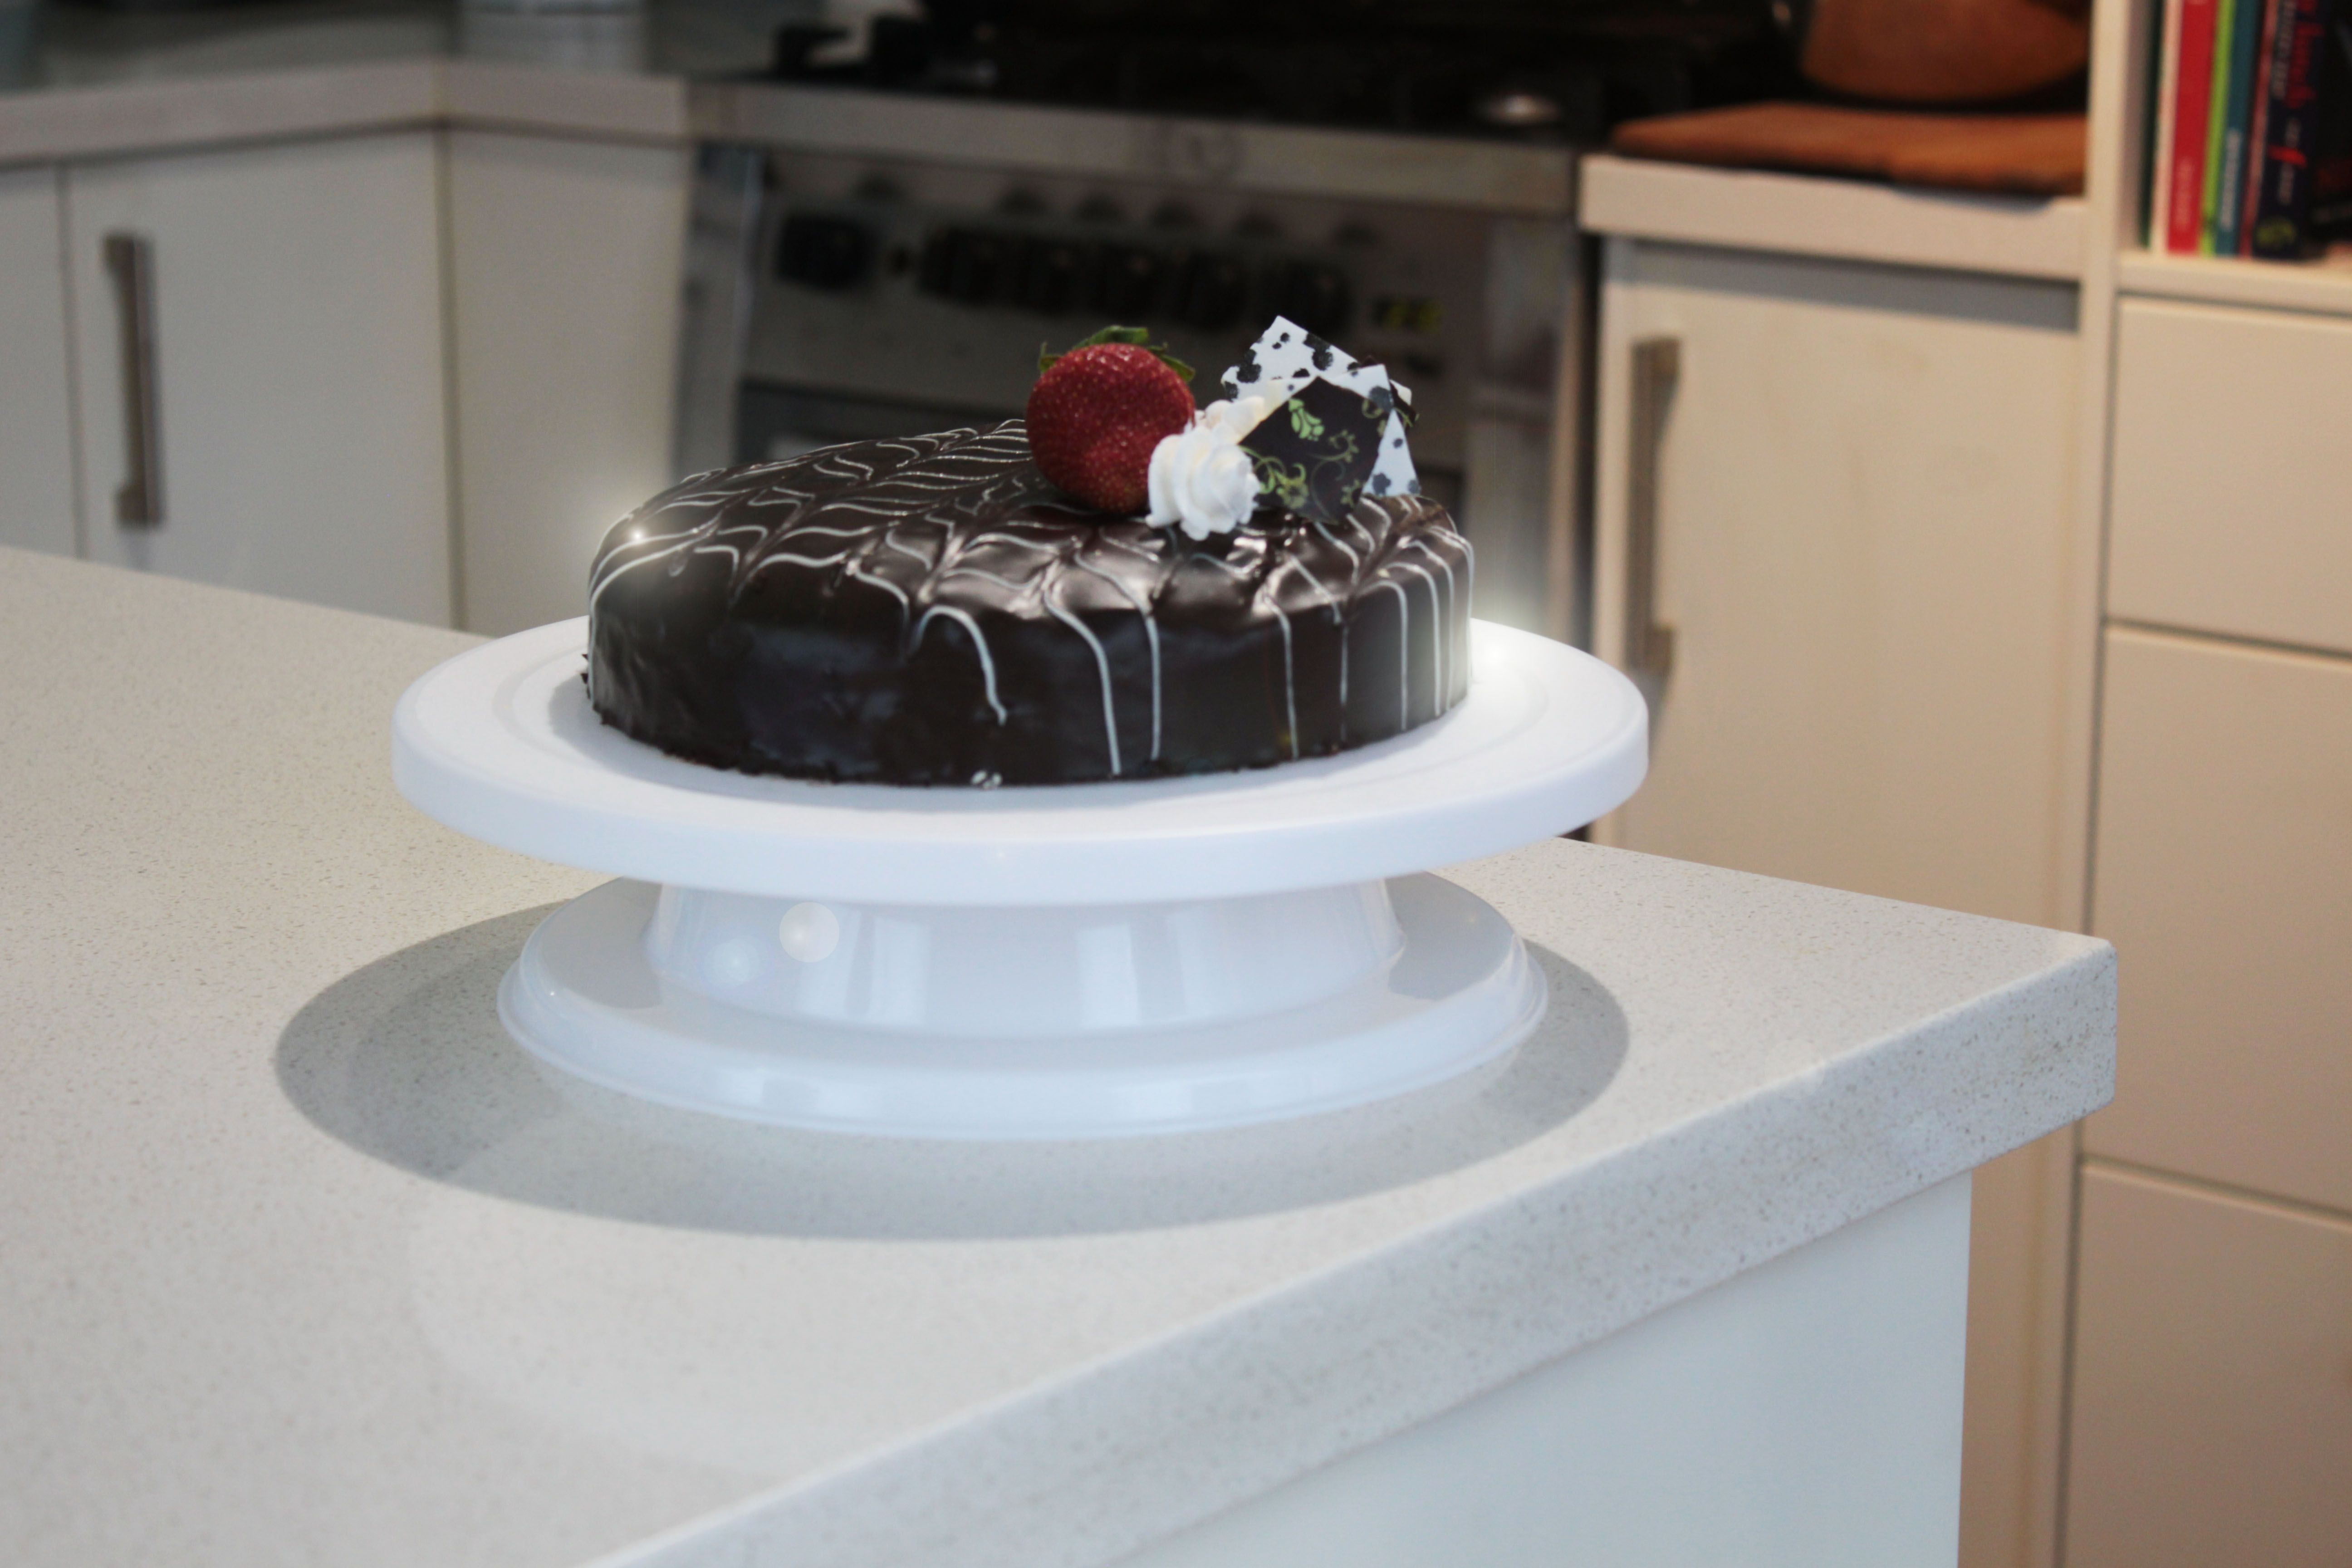 Cake decorating kit cake decorating kits cake